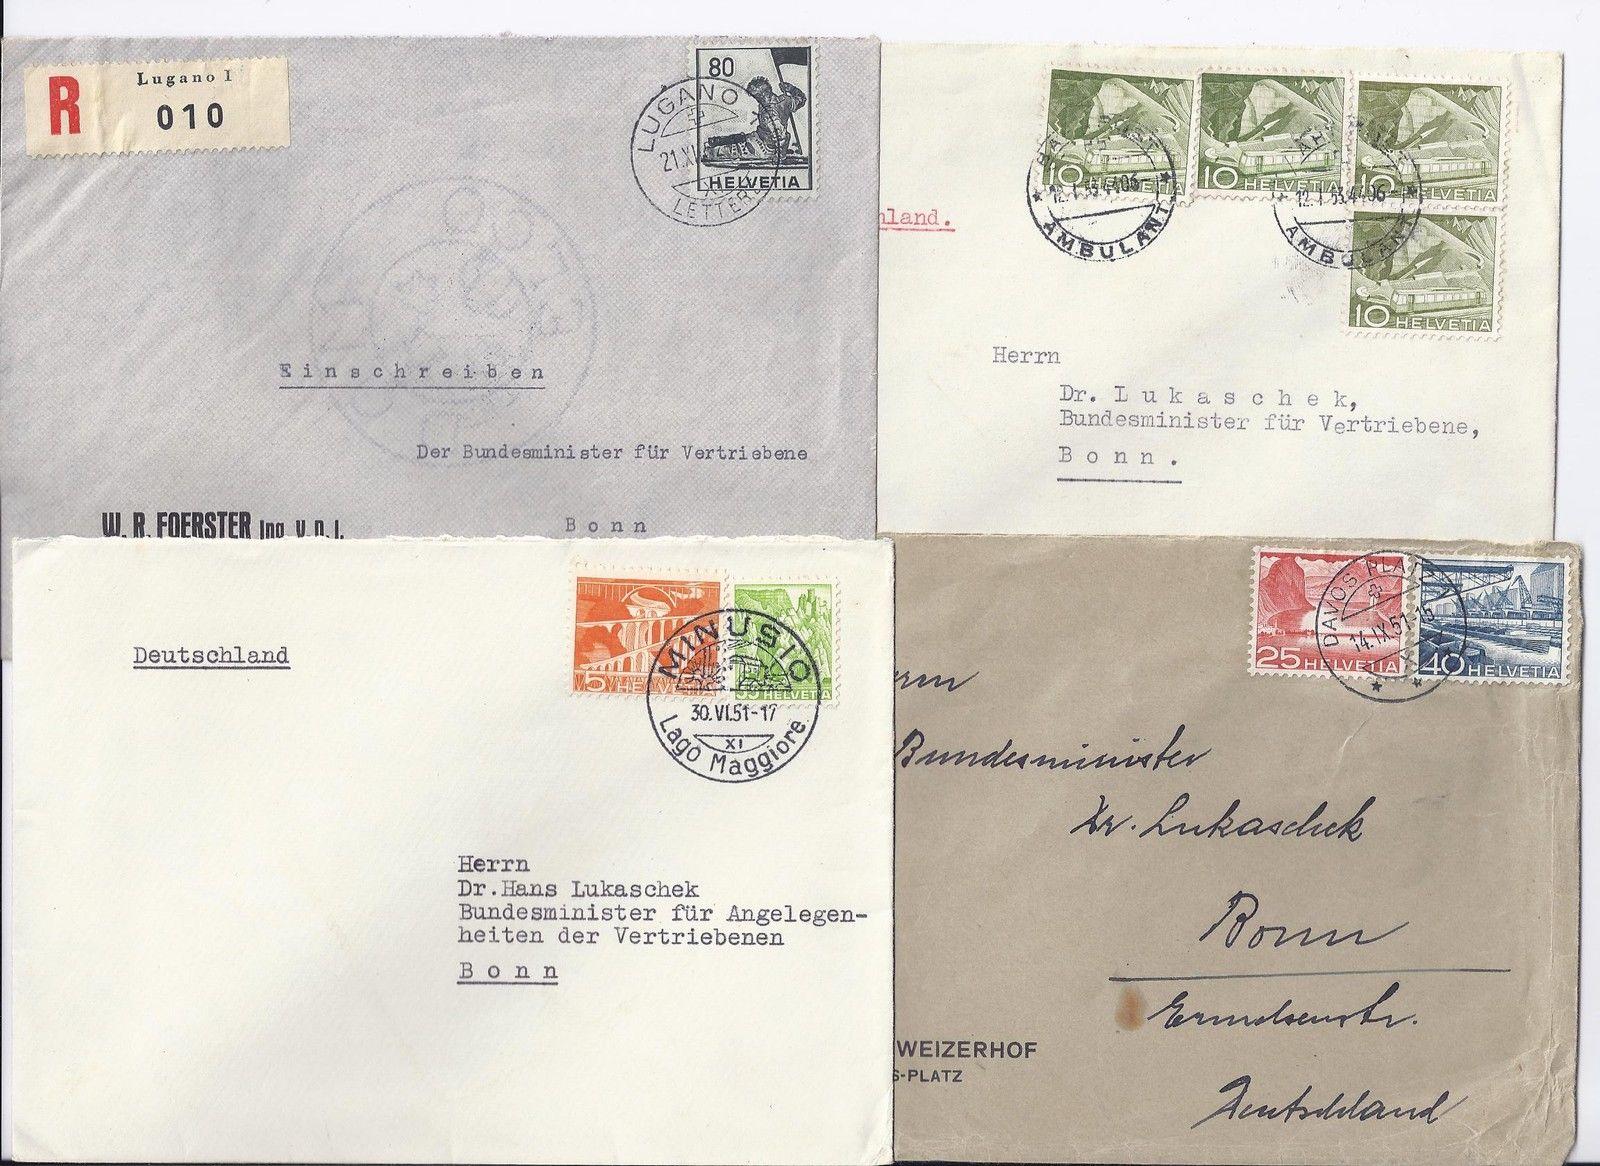 Schweiz 195153 4 Brief An Brd Minister F Vertriebene Dr